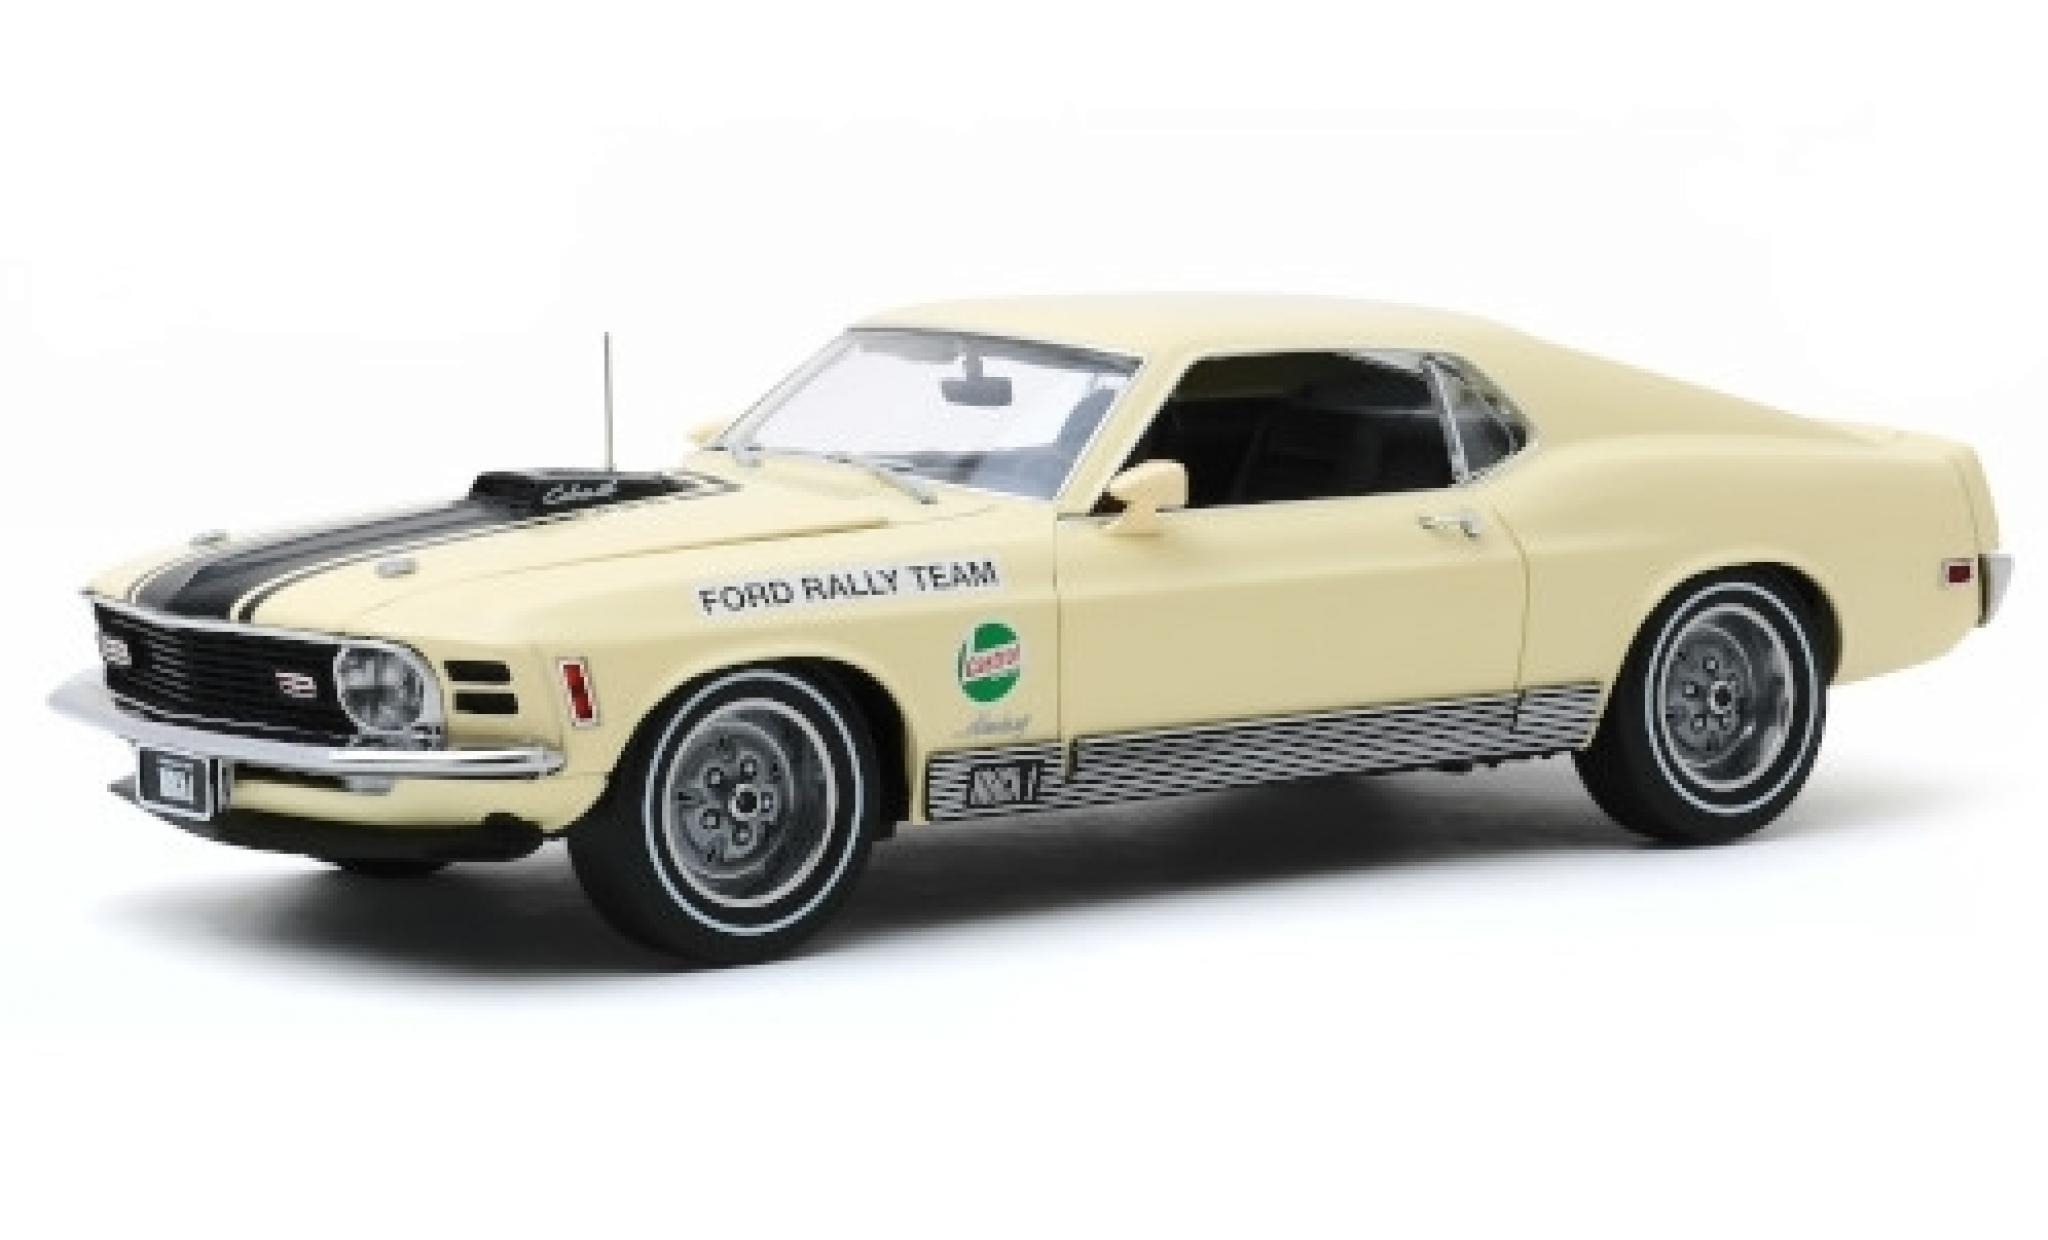 Ford Mustang 1/18 Greenlight Mach 1 428 beige/matt-noire Rally Team Castrol SCCA Manufacturers Road Rally 1970